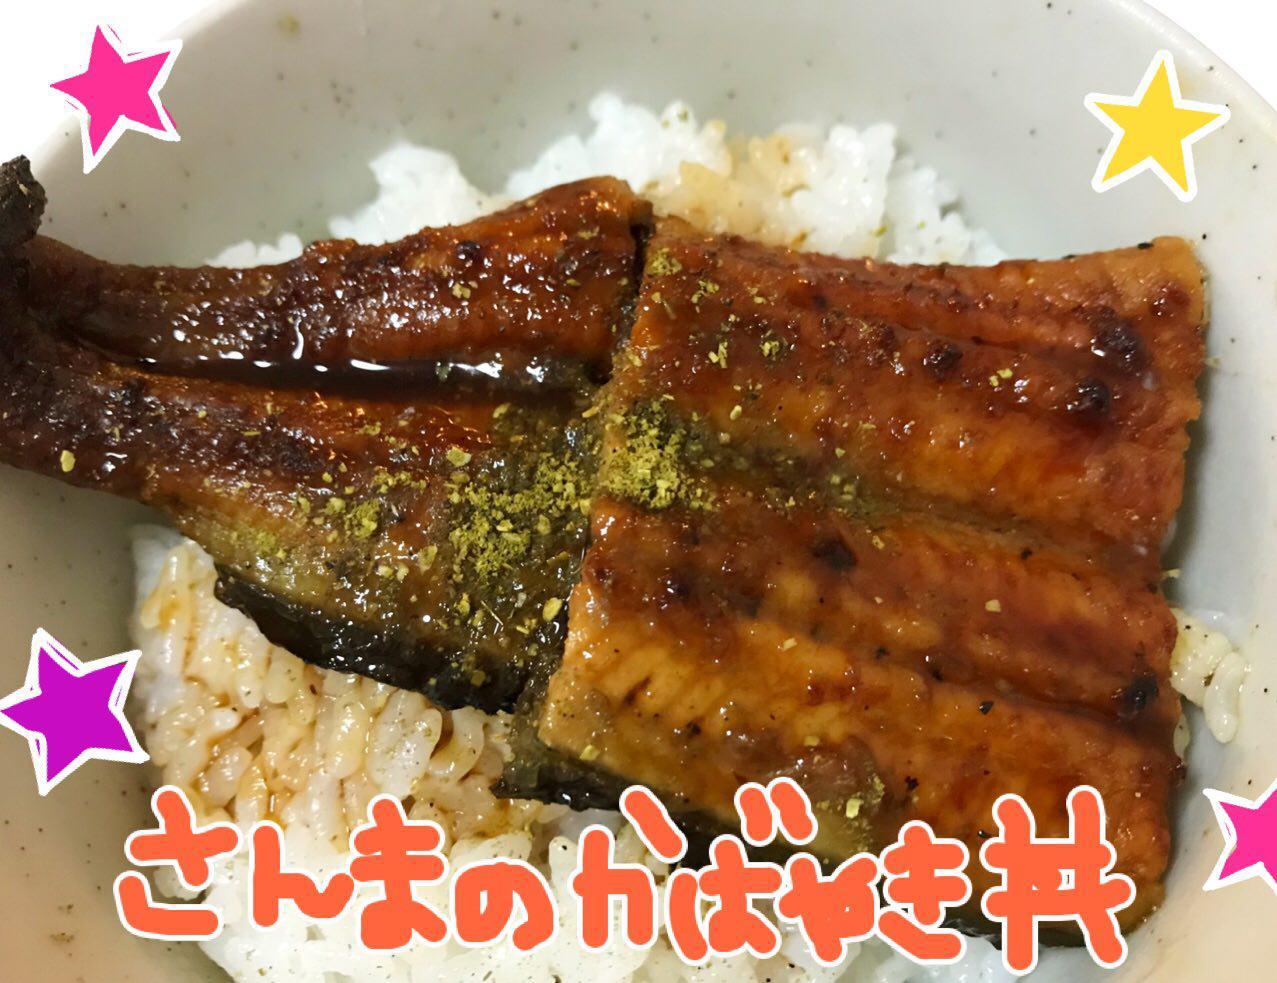 photo_2017-11-13_22-02-00.jpg